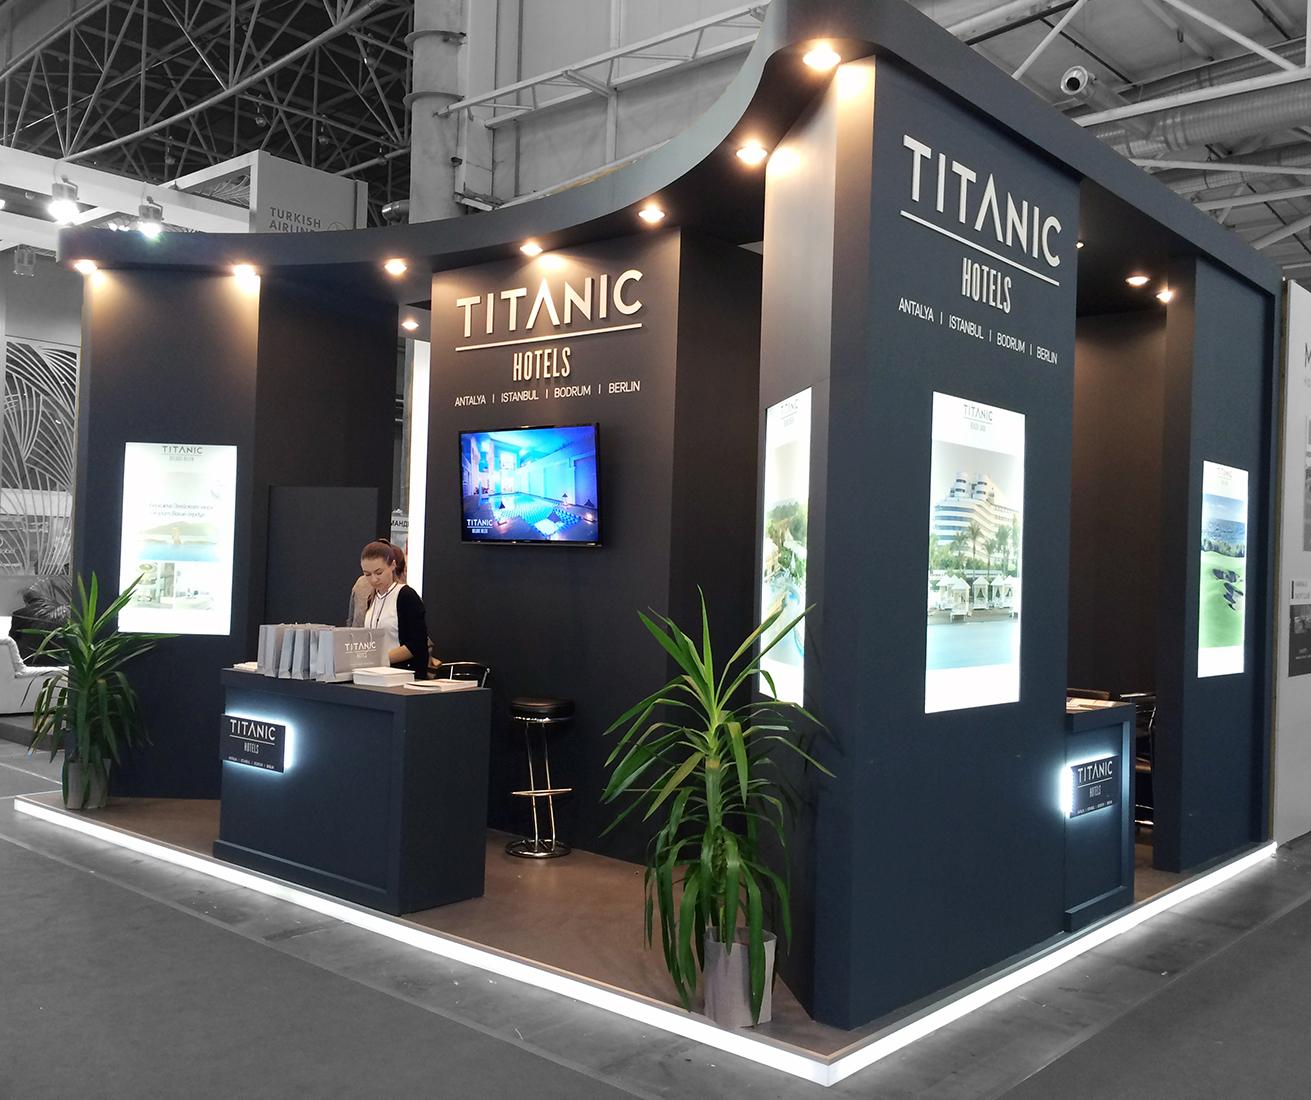 TITANIC-next